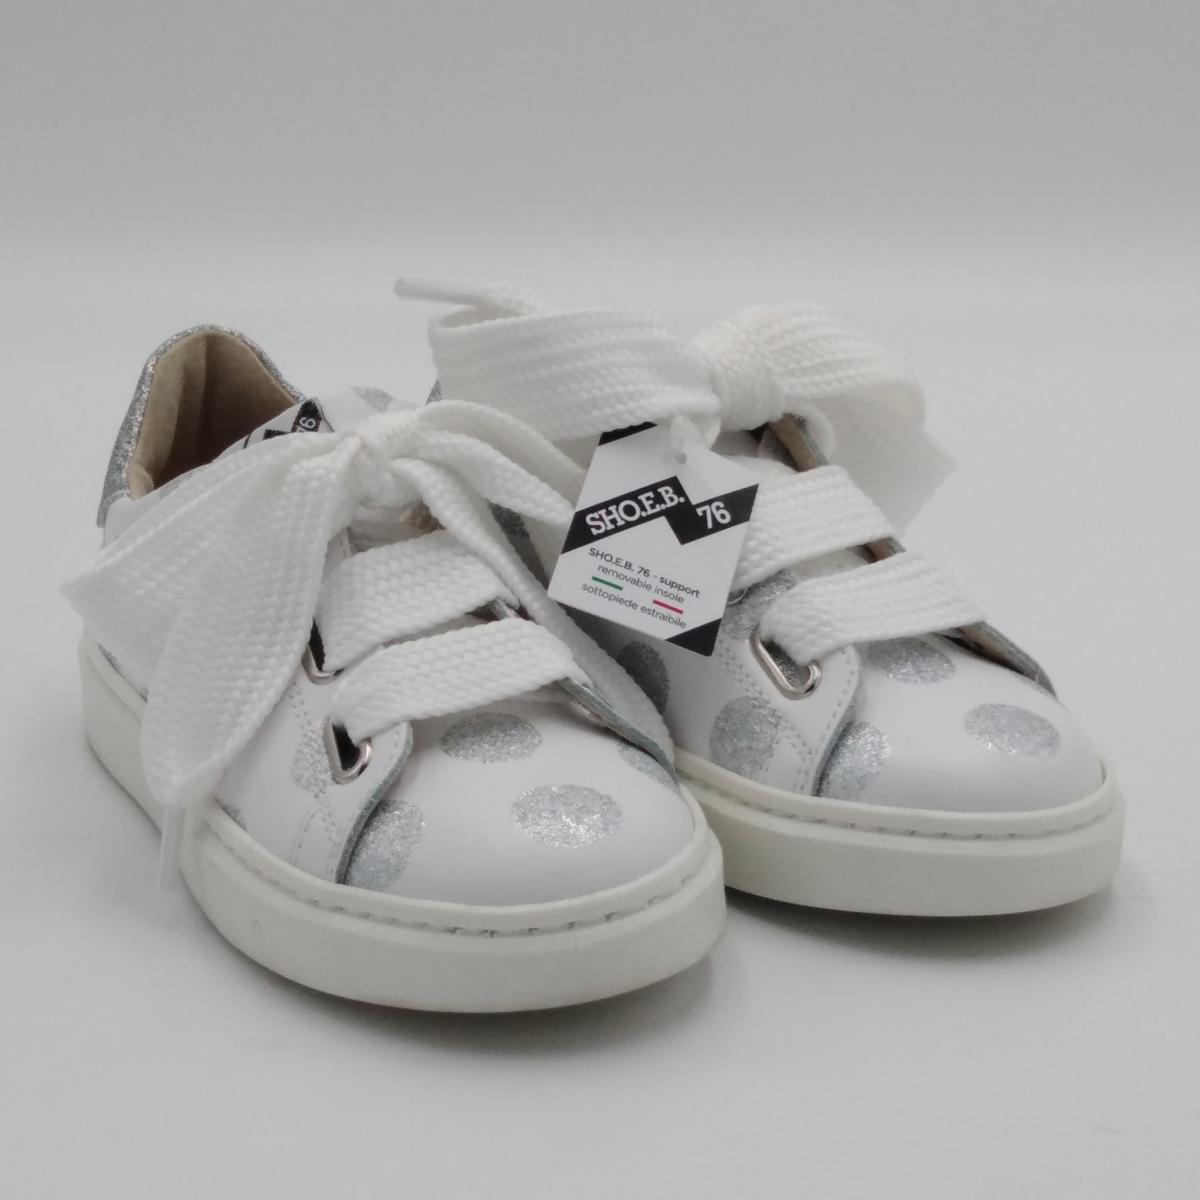 Sneaker lacci bianco pois...